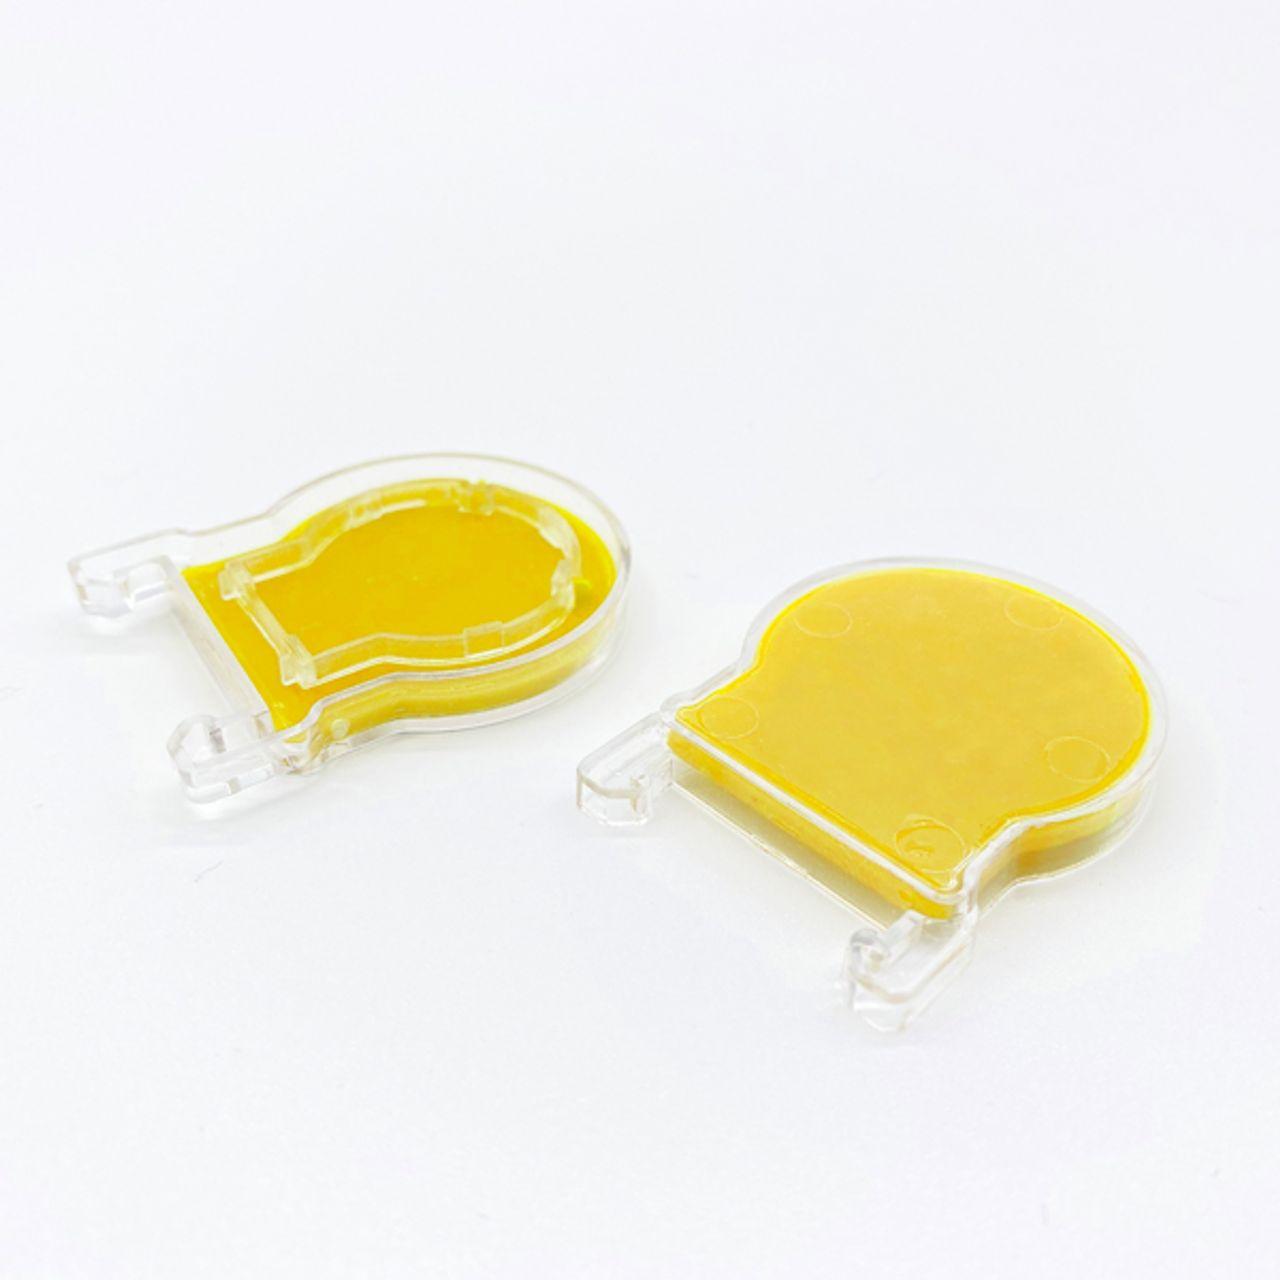 Lucoline® Endkappe Zitronengelb